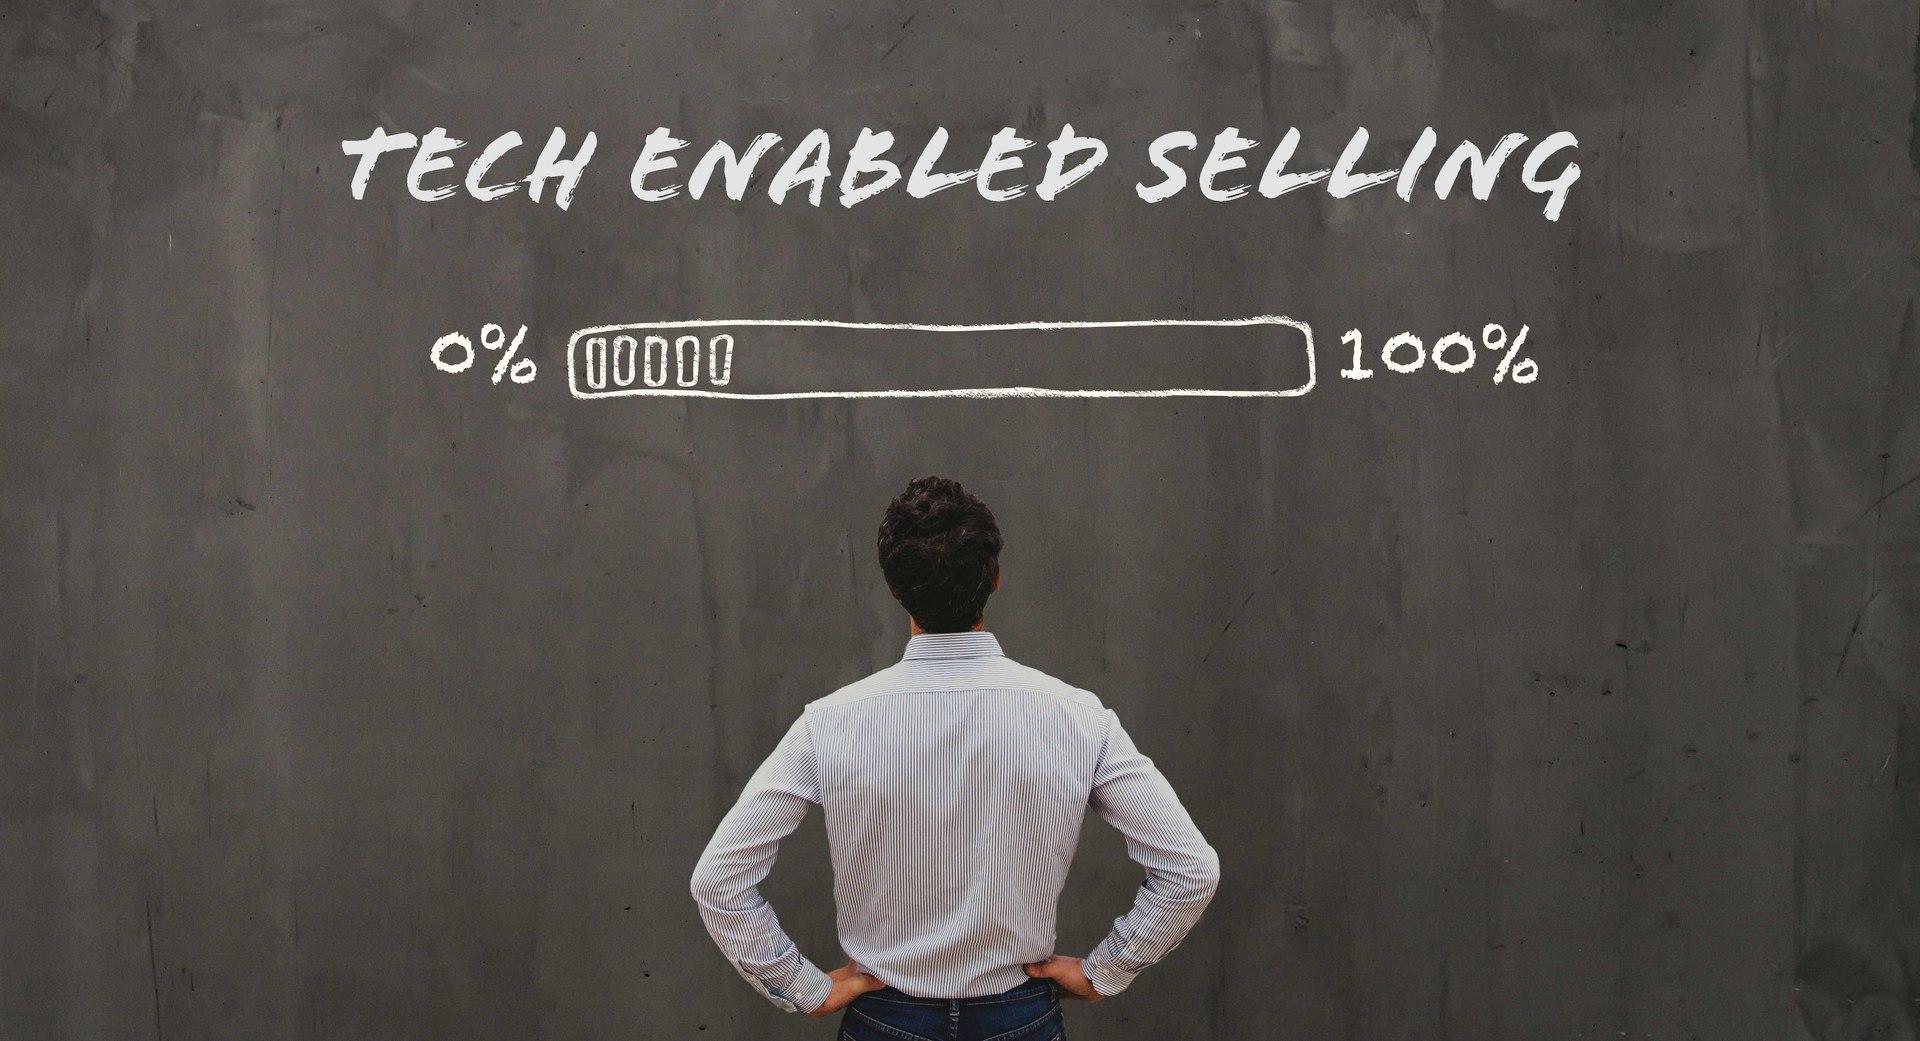 Digital transformation, tech enabled selling, technology, b2b salg, b2b sales, process